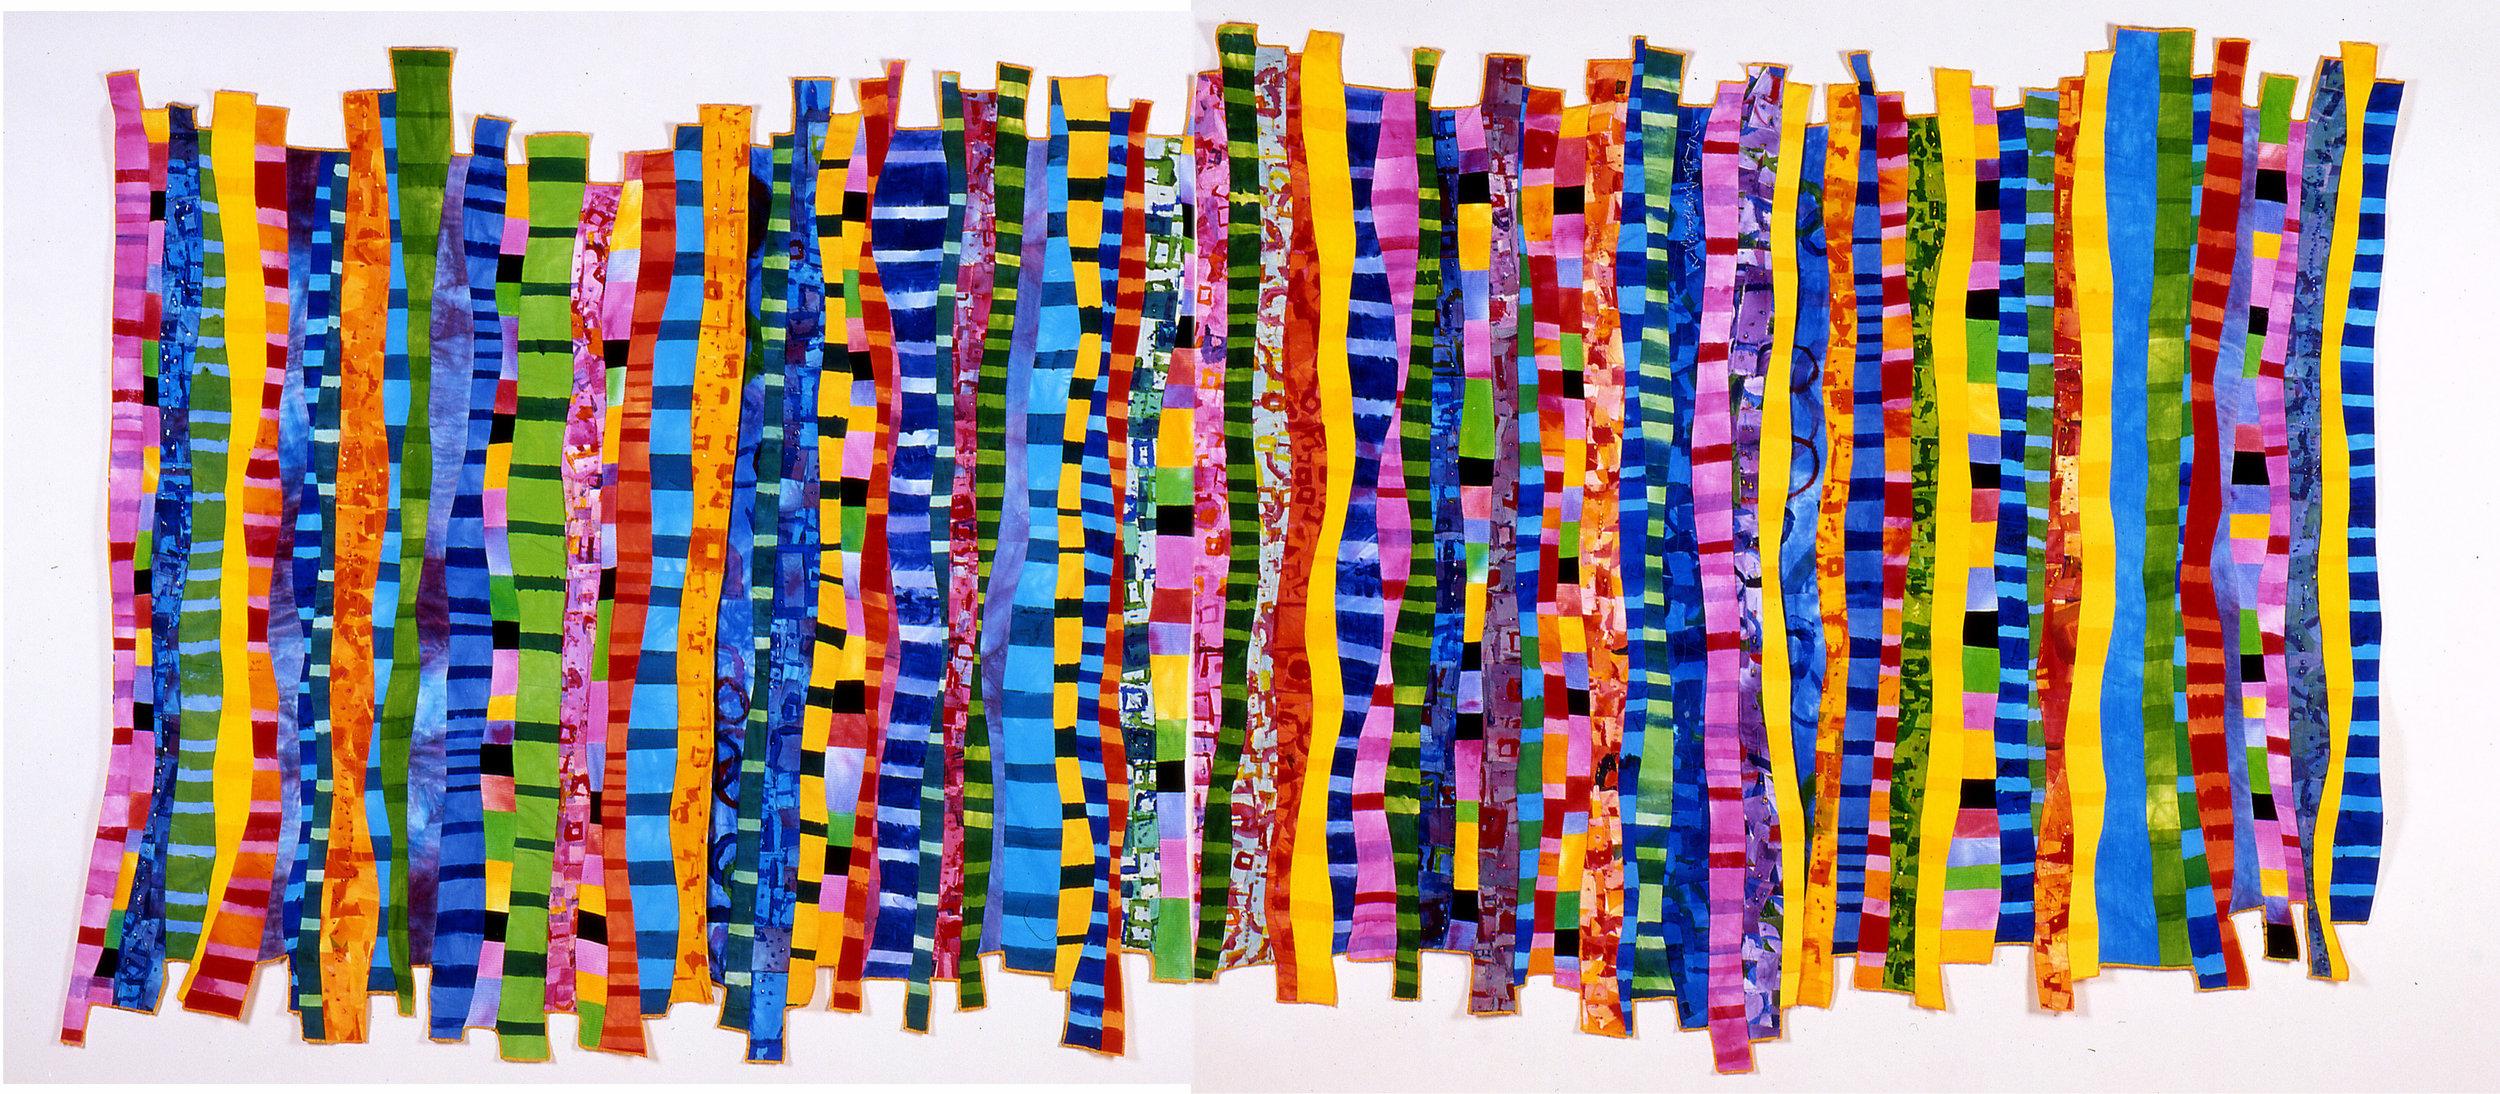 Wacky Wonderfulation , created with Scroggs Elementary students. Chapel Hill, NC, 2005.